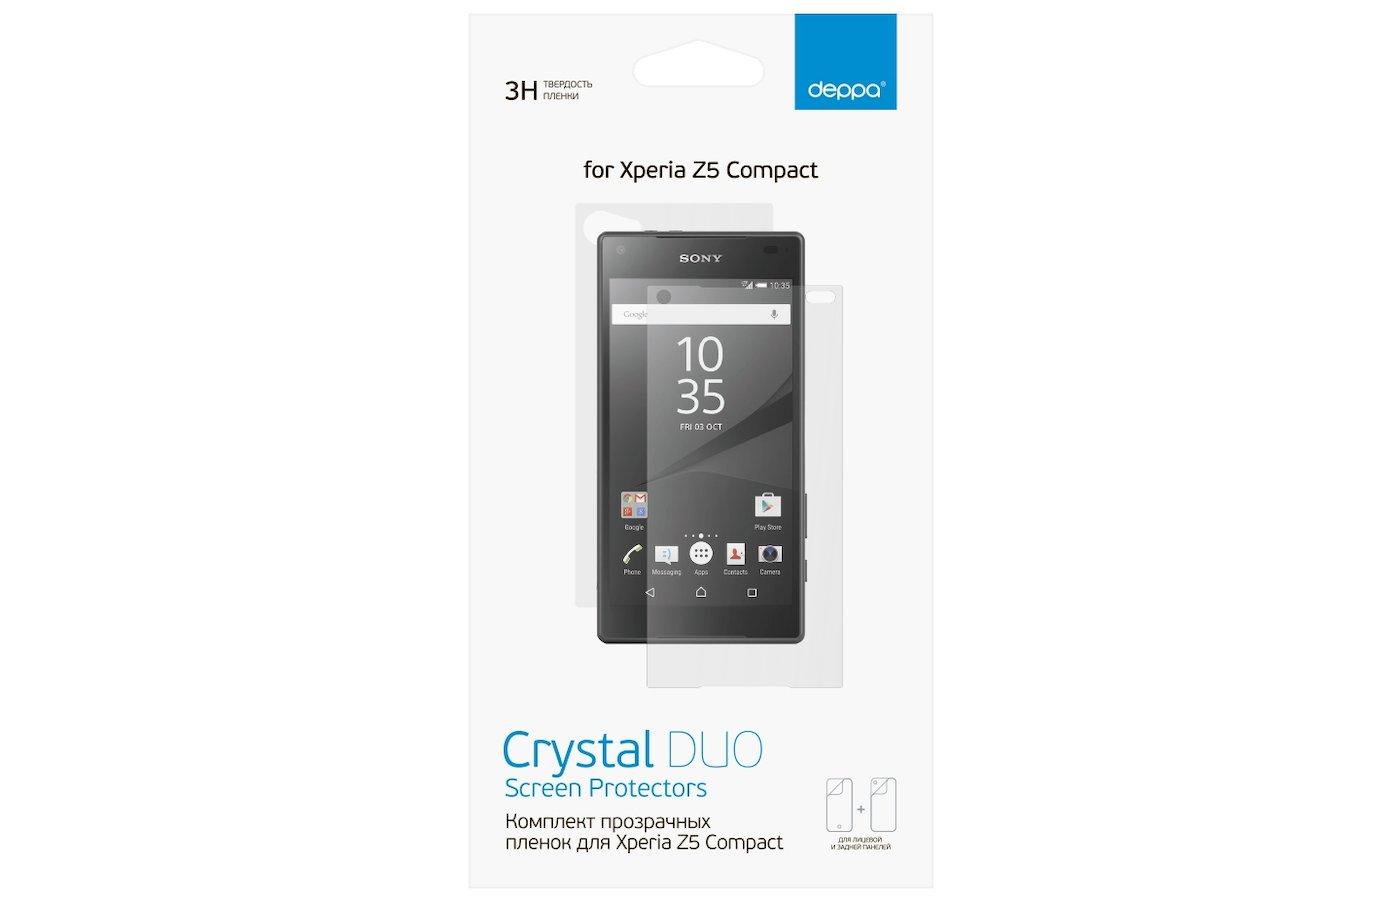 Стекло Deppa пленка для Sony Xperia Z5 Compact (Front/Back) прозрачная